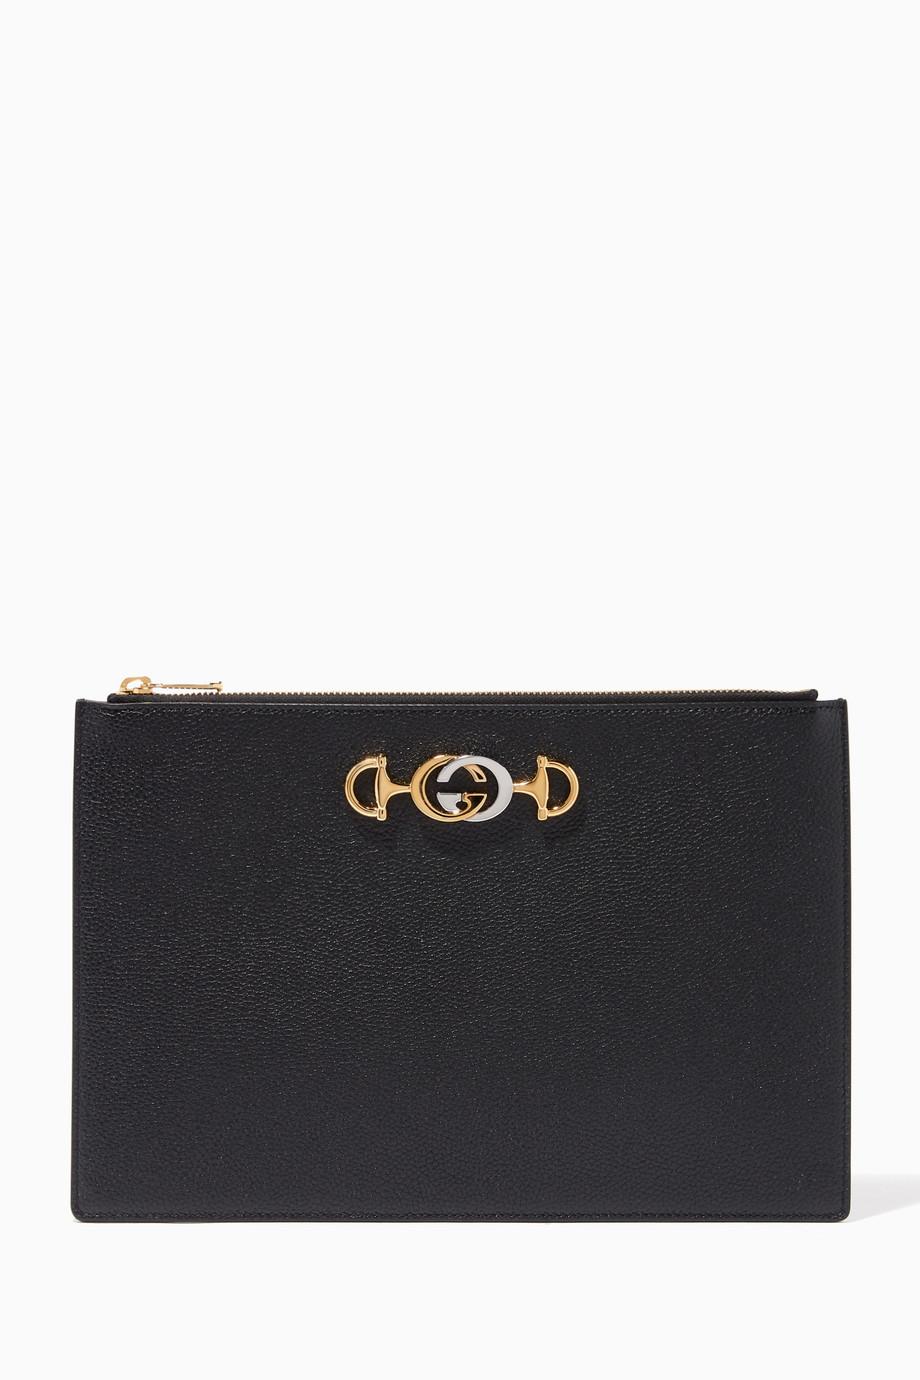 fa77cd3336b8 Shop Gucci Black Zumi Grainy Leather Pouch for Women